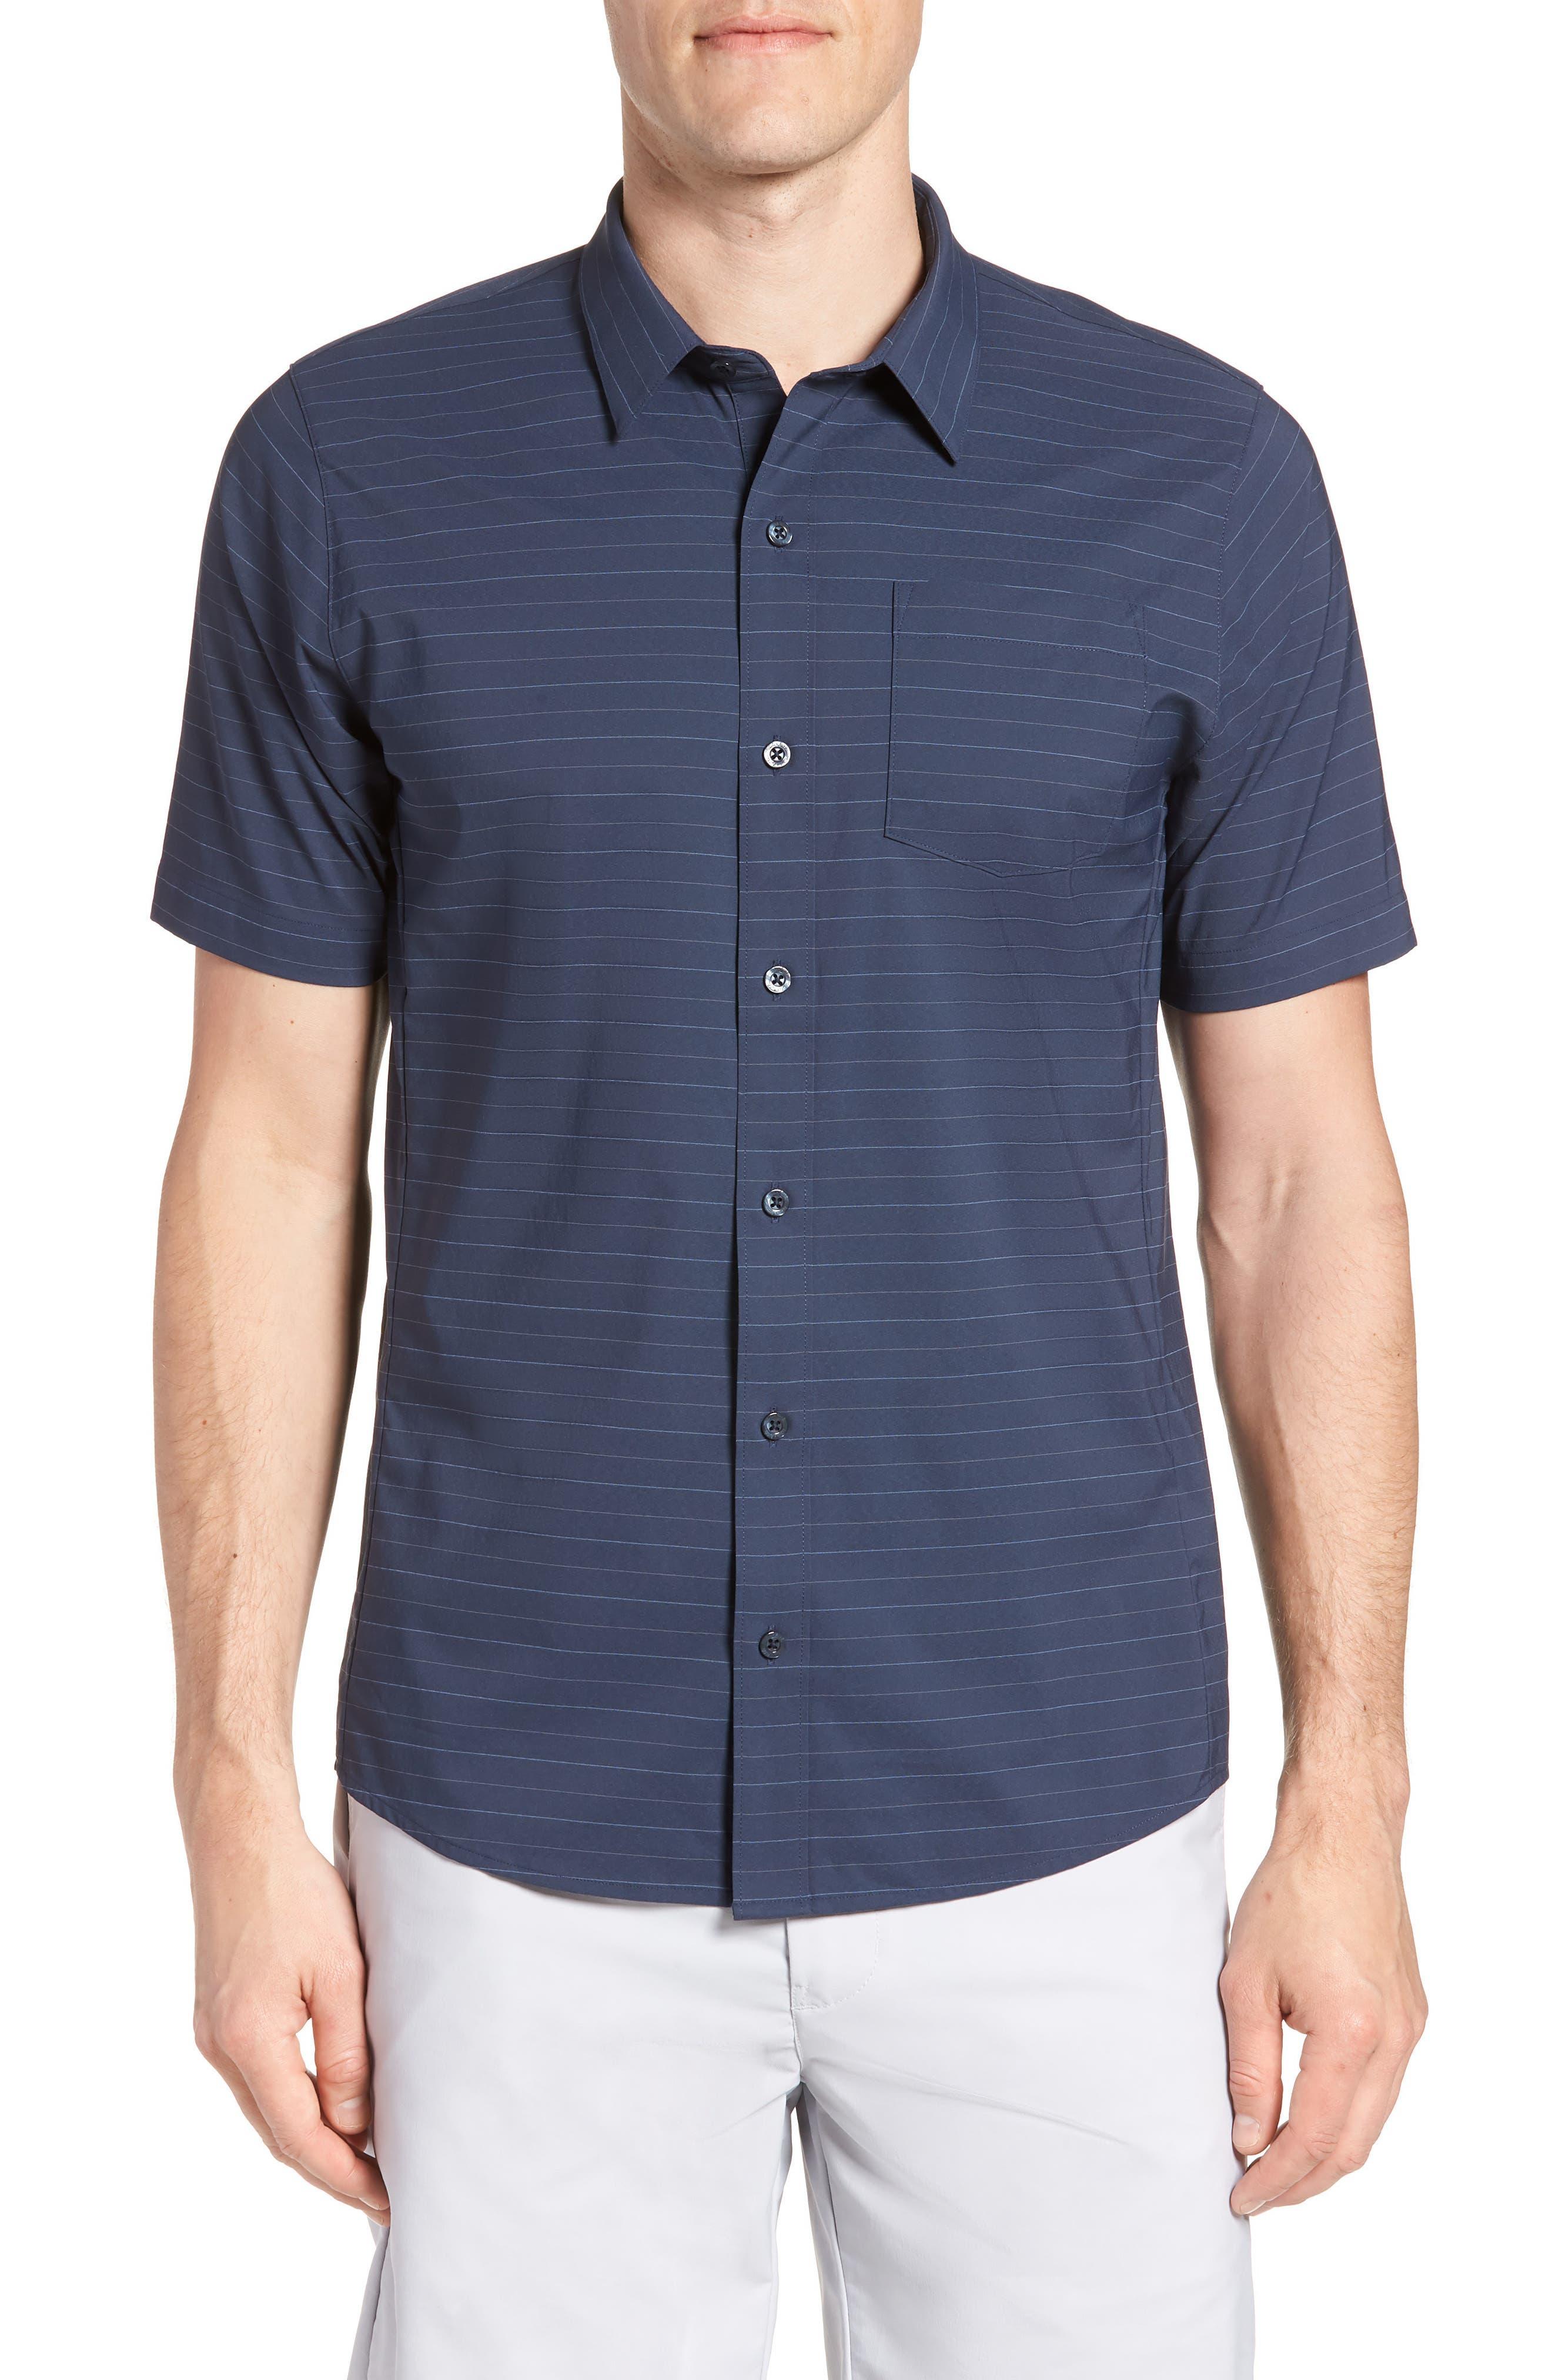 Vagabond Regular Fit Sport Shirt,                             Main thumbnail 1, color,                             HEATHER BLUE NIGHTS